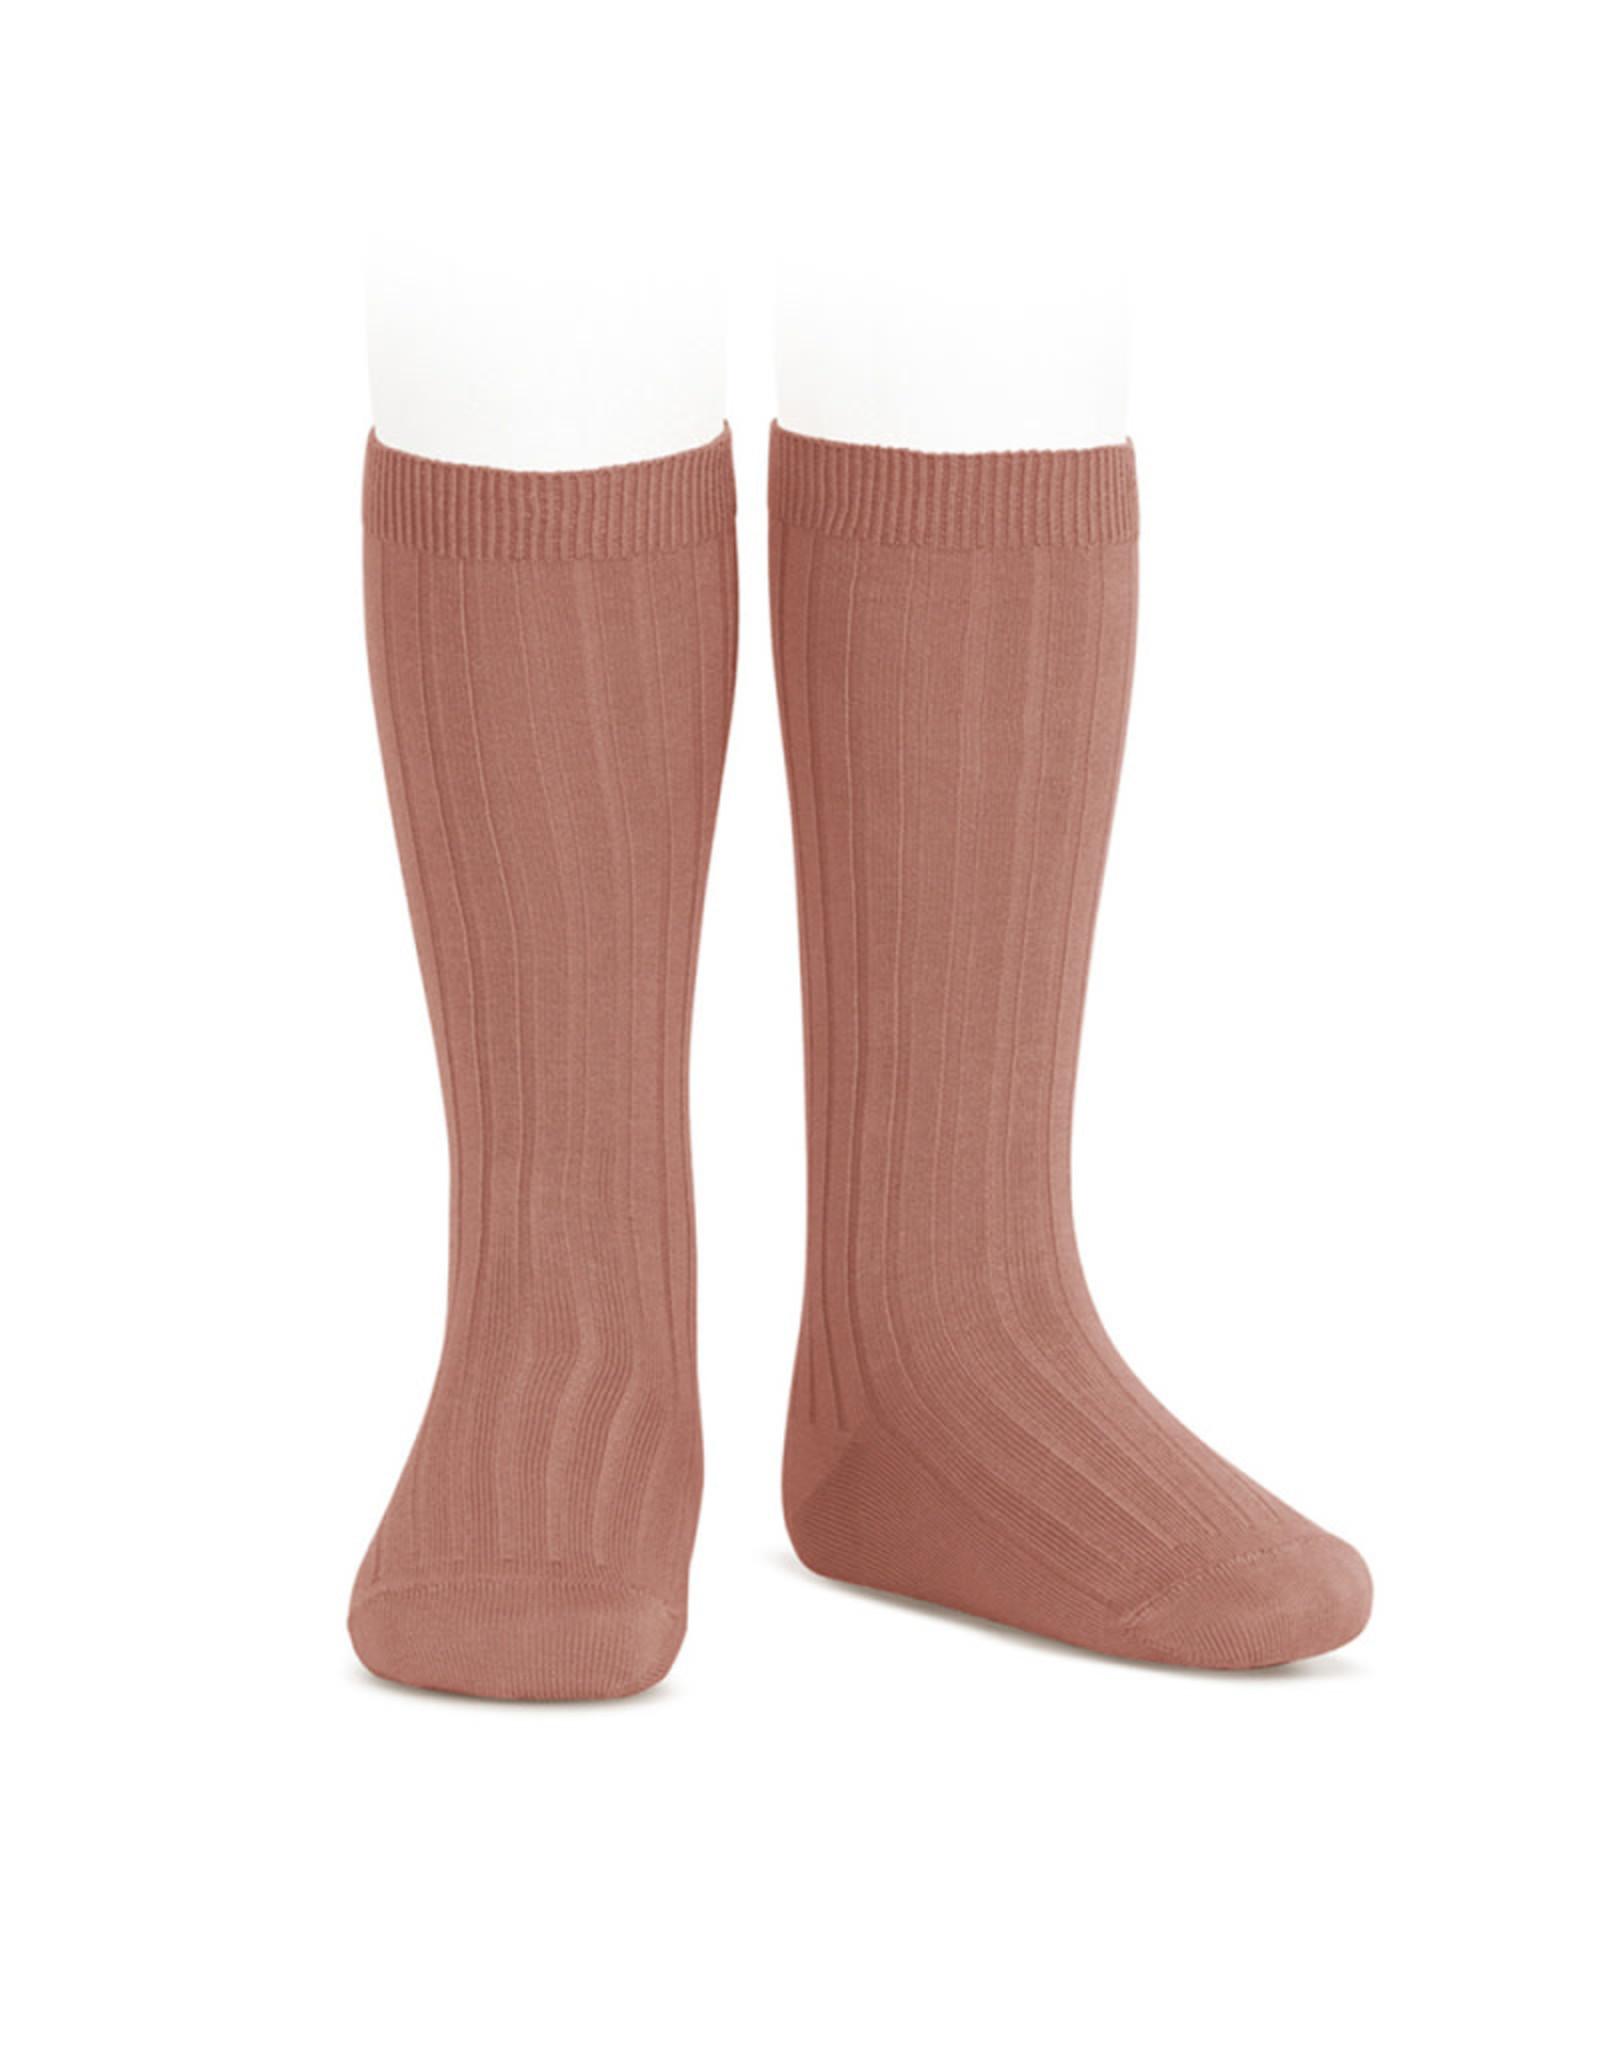 CONDOR Terracotta Ribbed Knee Socks